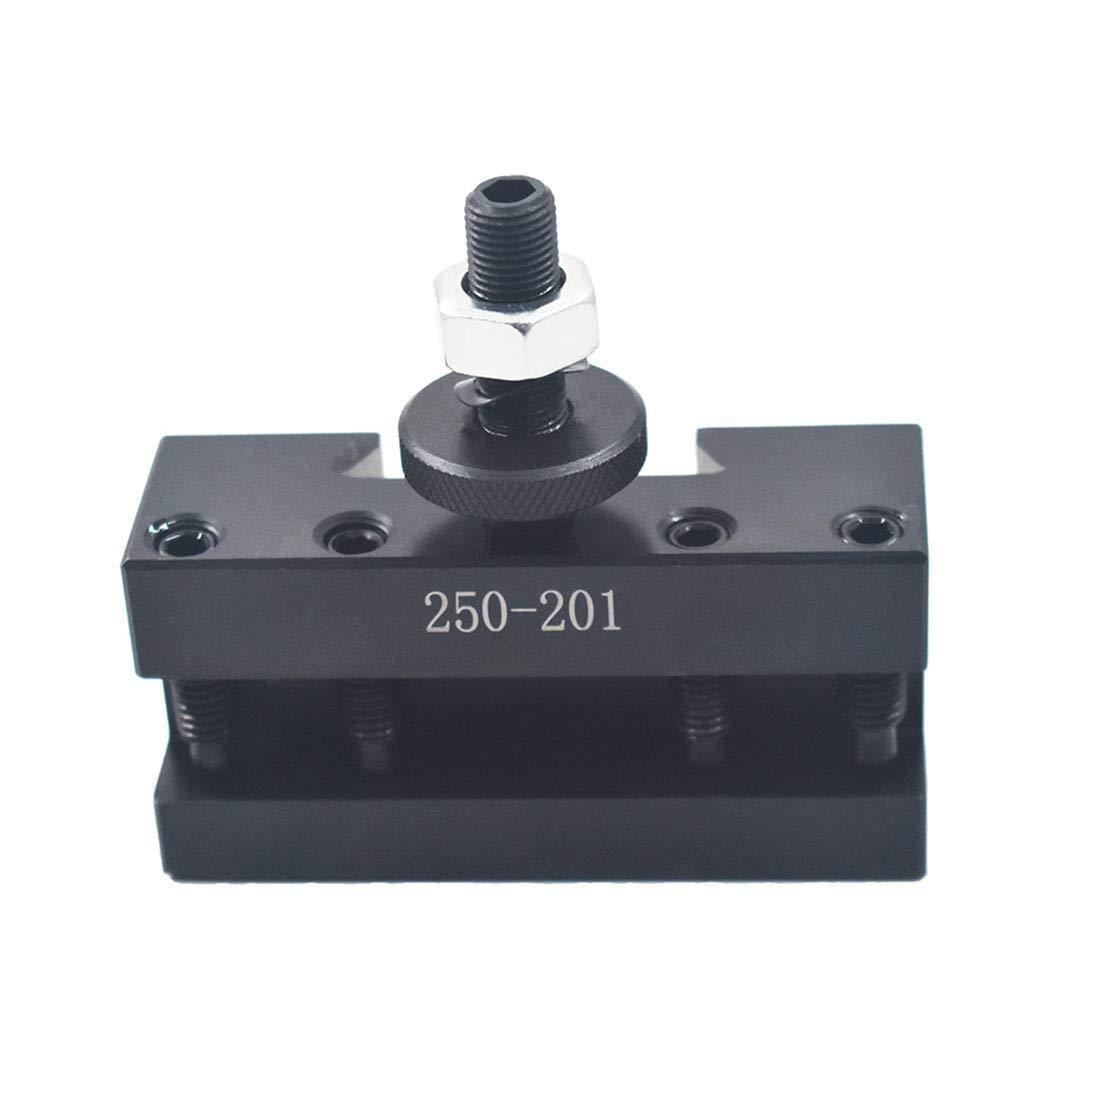 3Pcs BXA #1 Quick Change Turning /& Facing Lathe Tool Post Holder 250-201